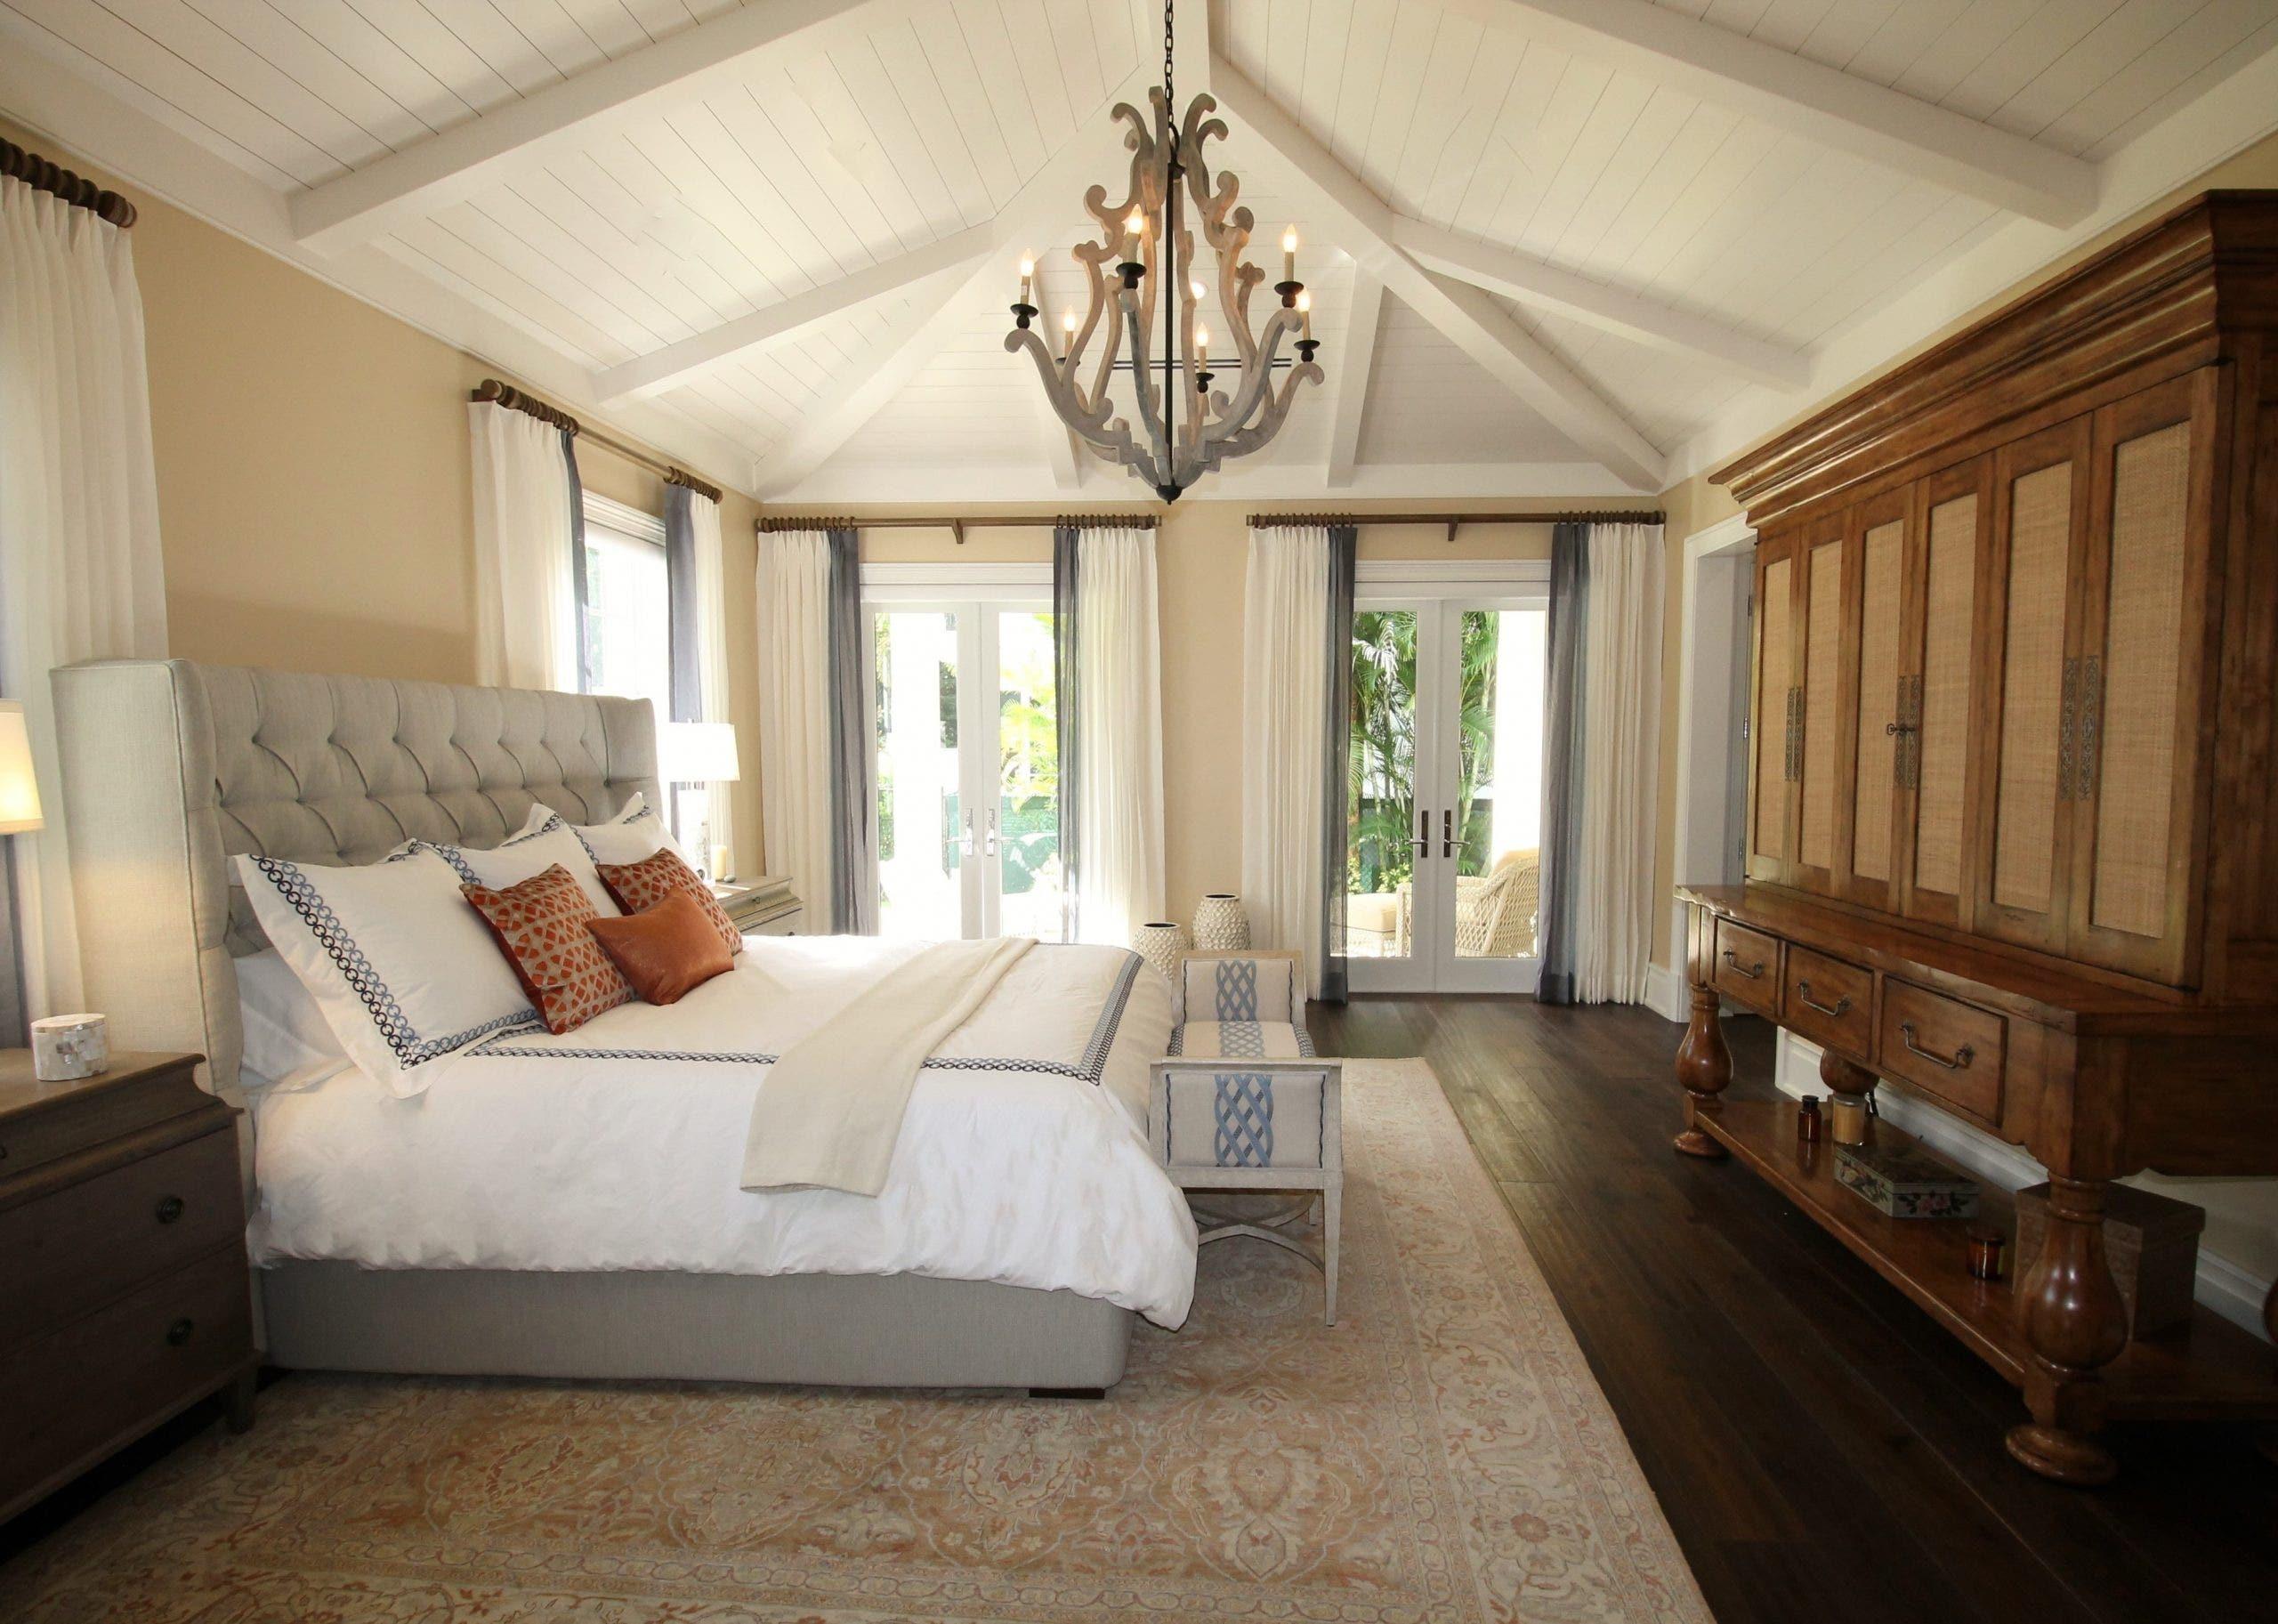 8 Farmhouse Design And Decor Ideas Just For You